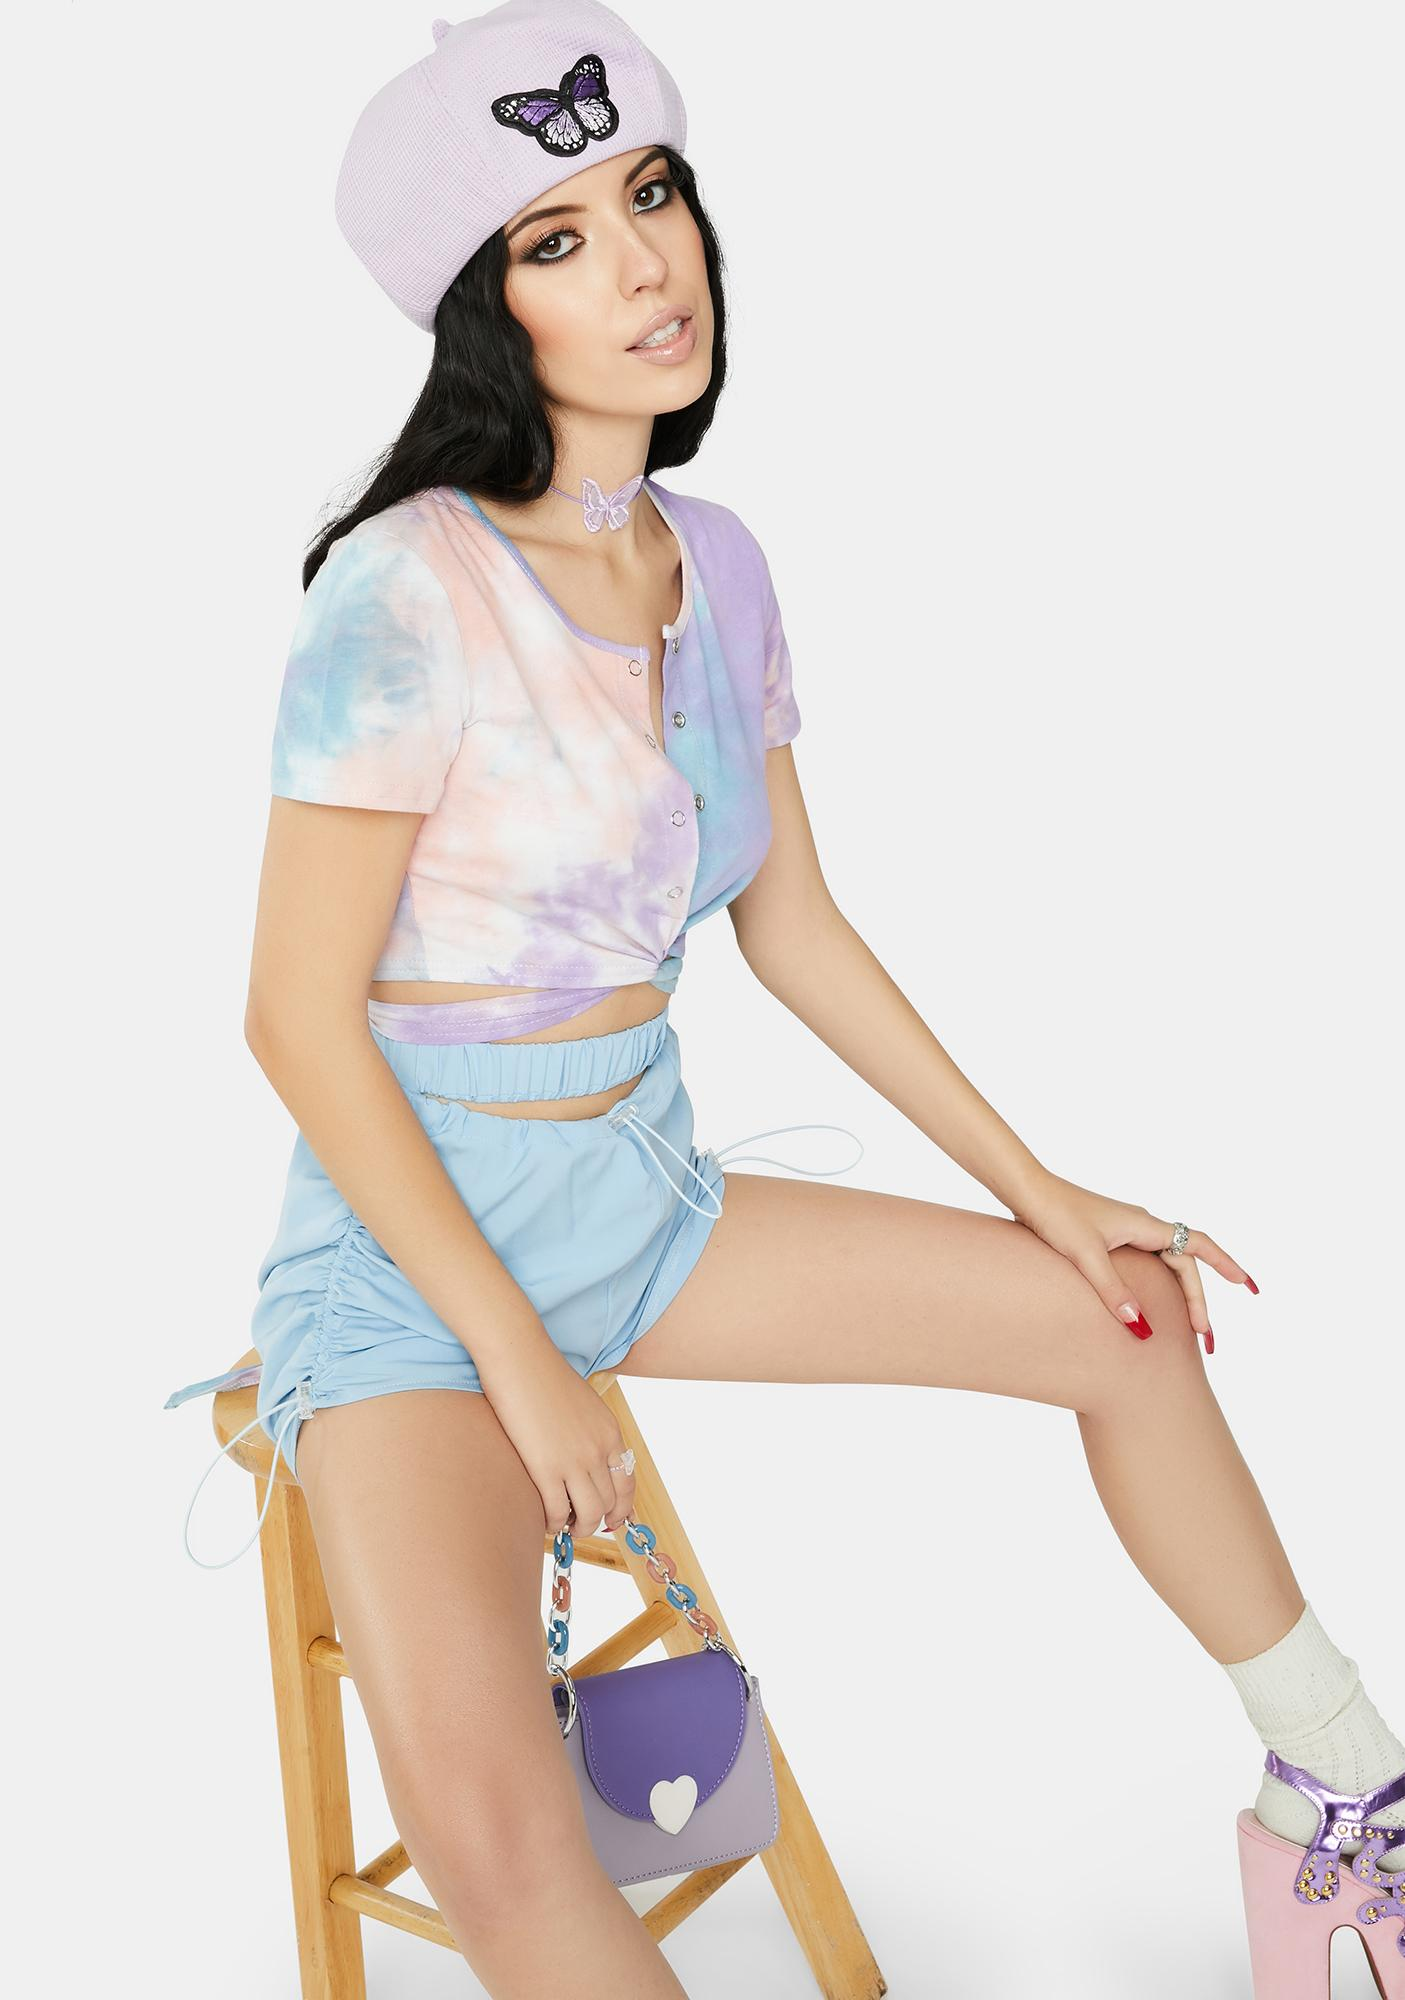 ZEMETA Candy Mix Tie Top